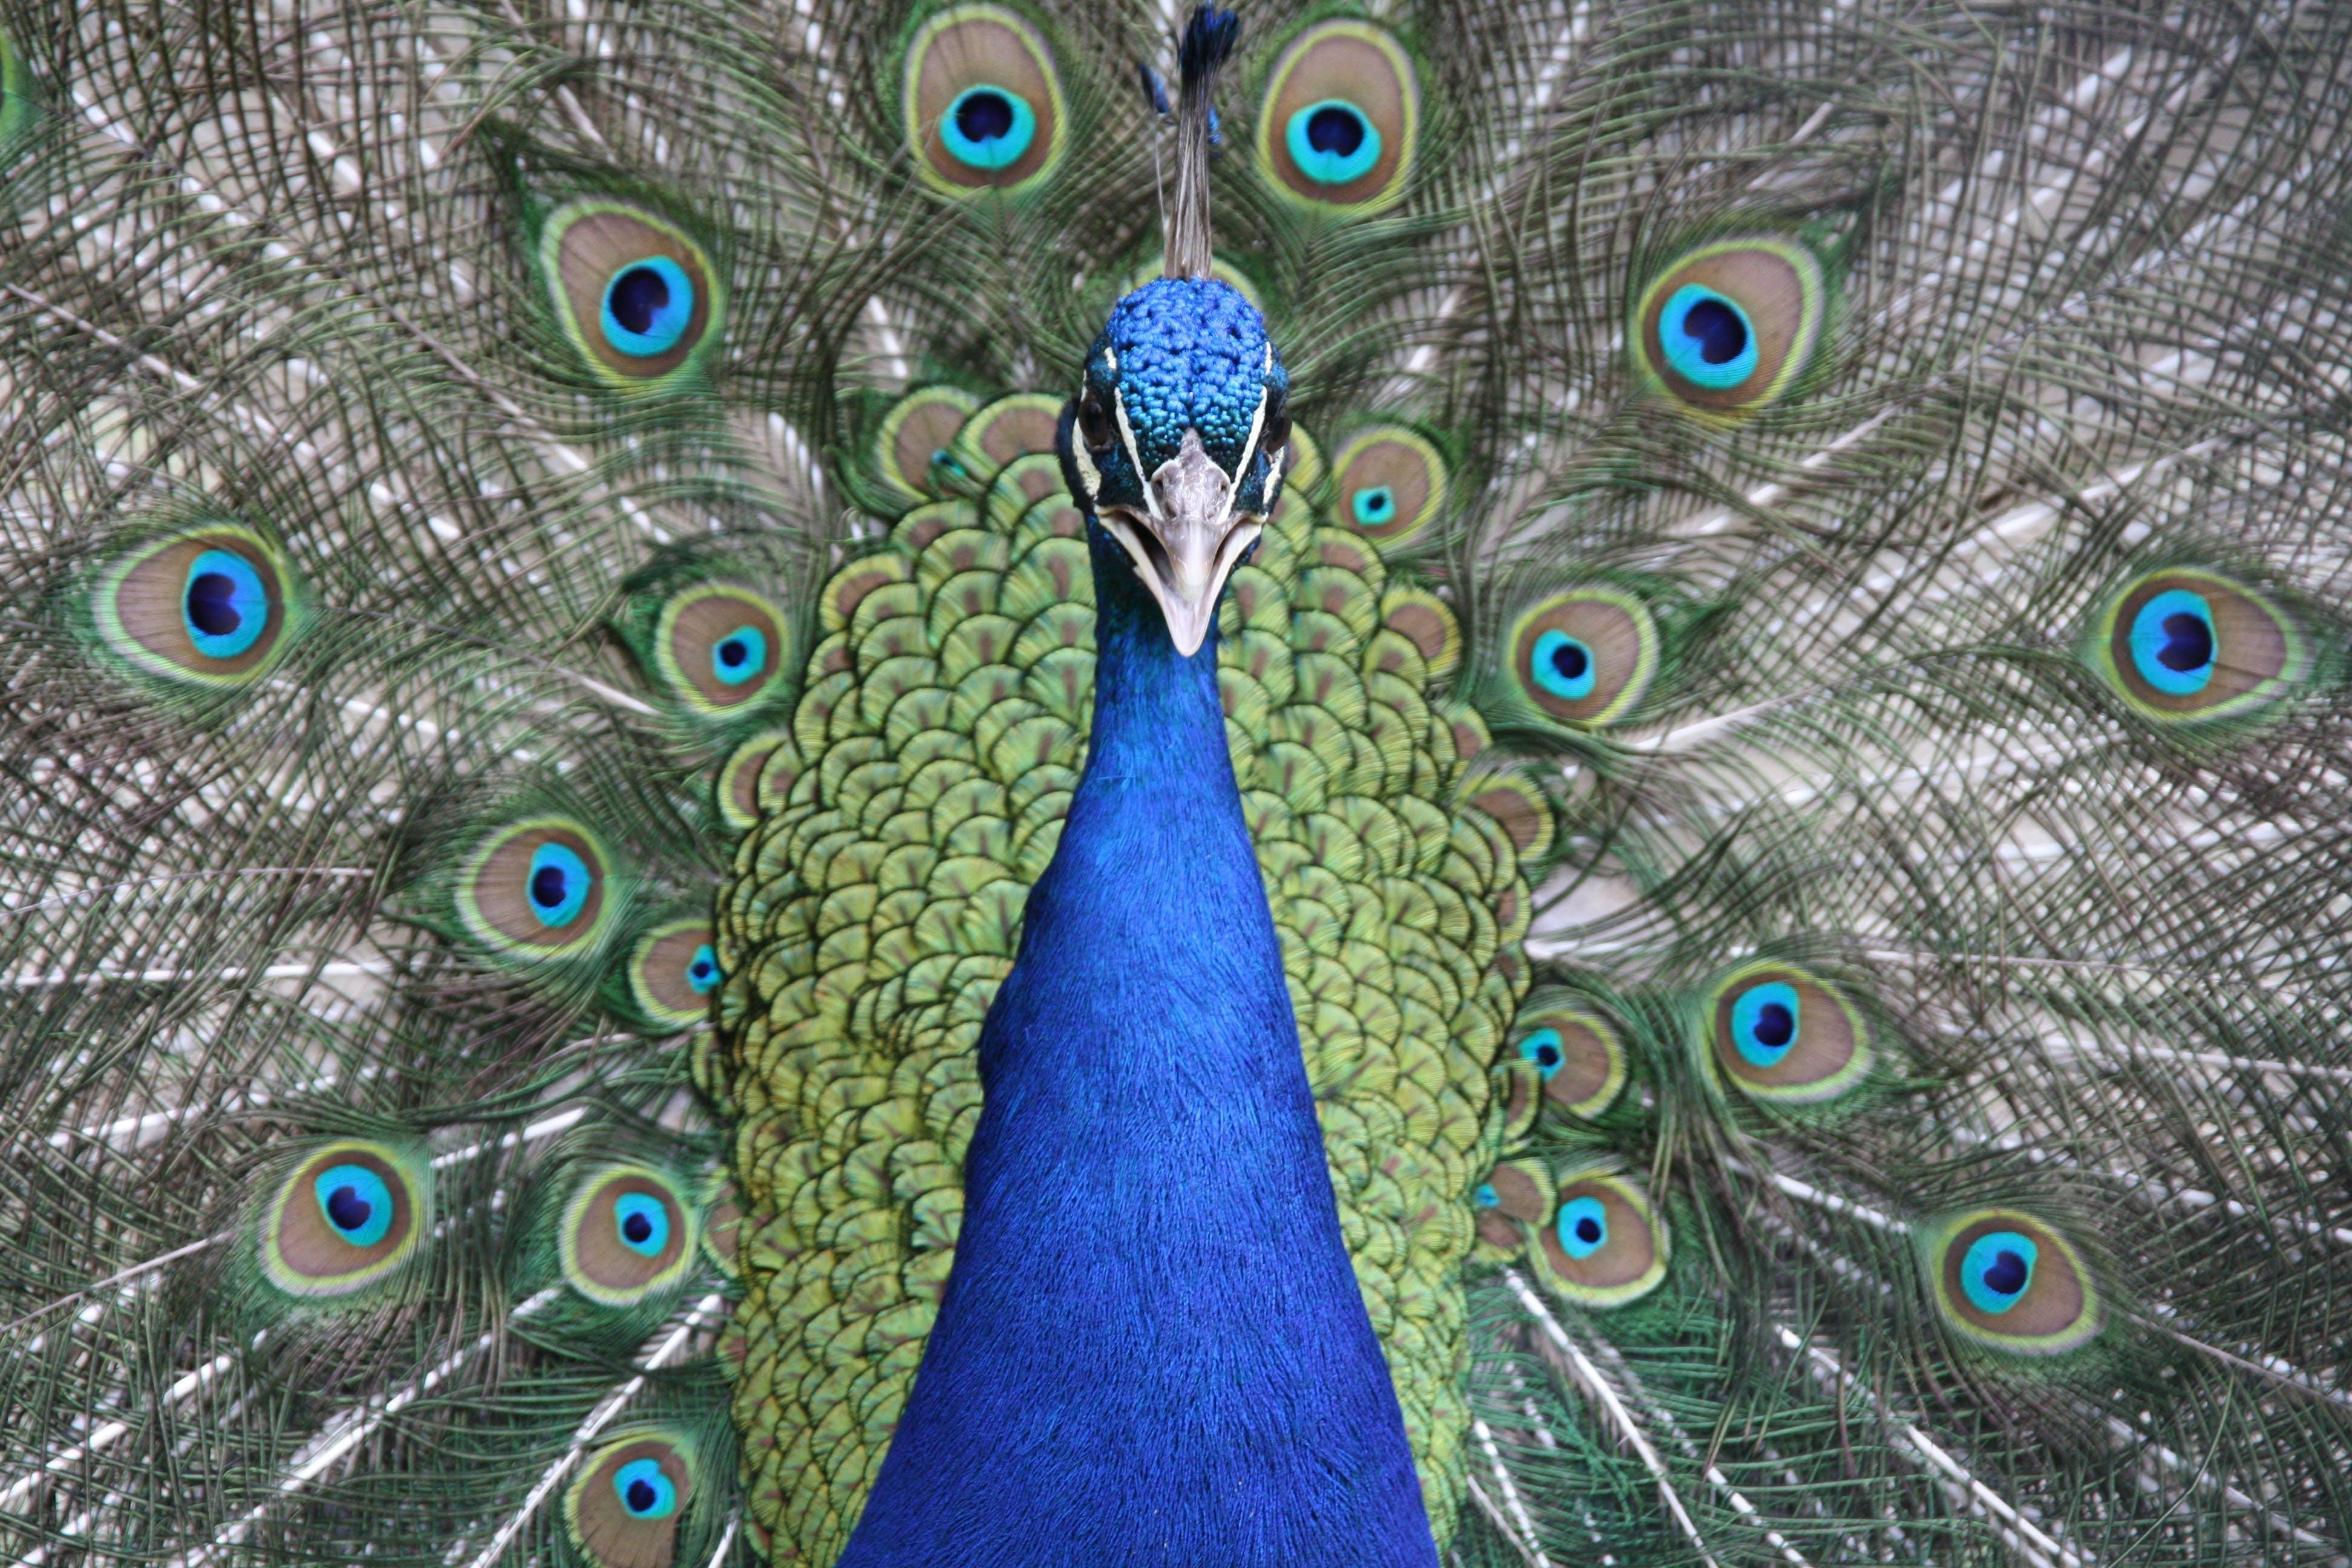 Selective Focus Photograph of Peacock